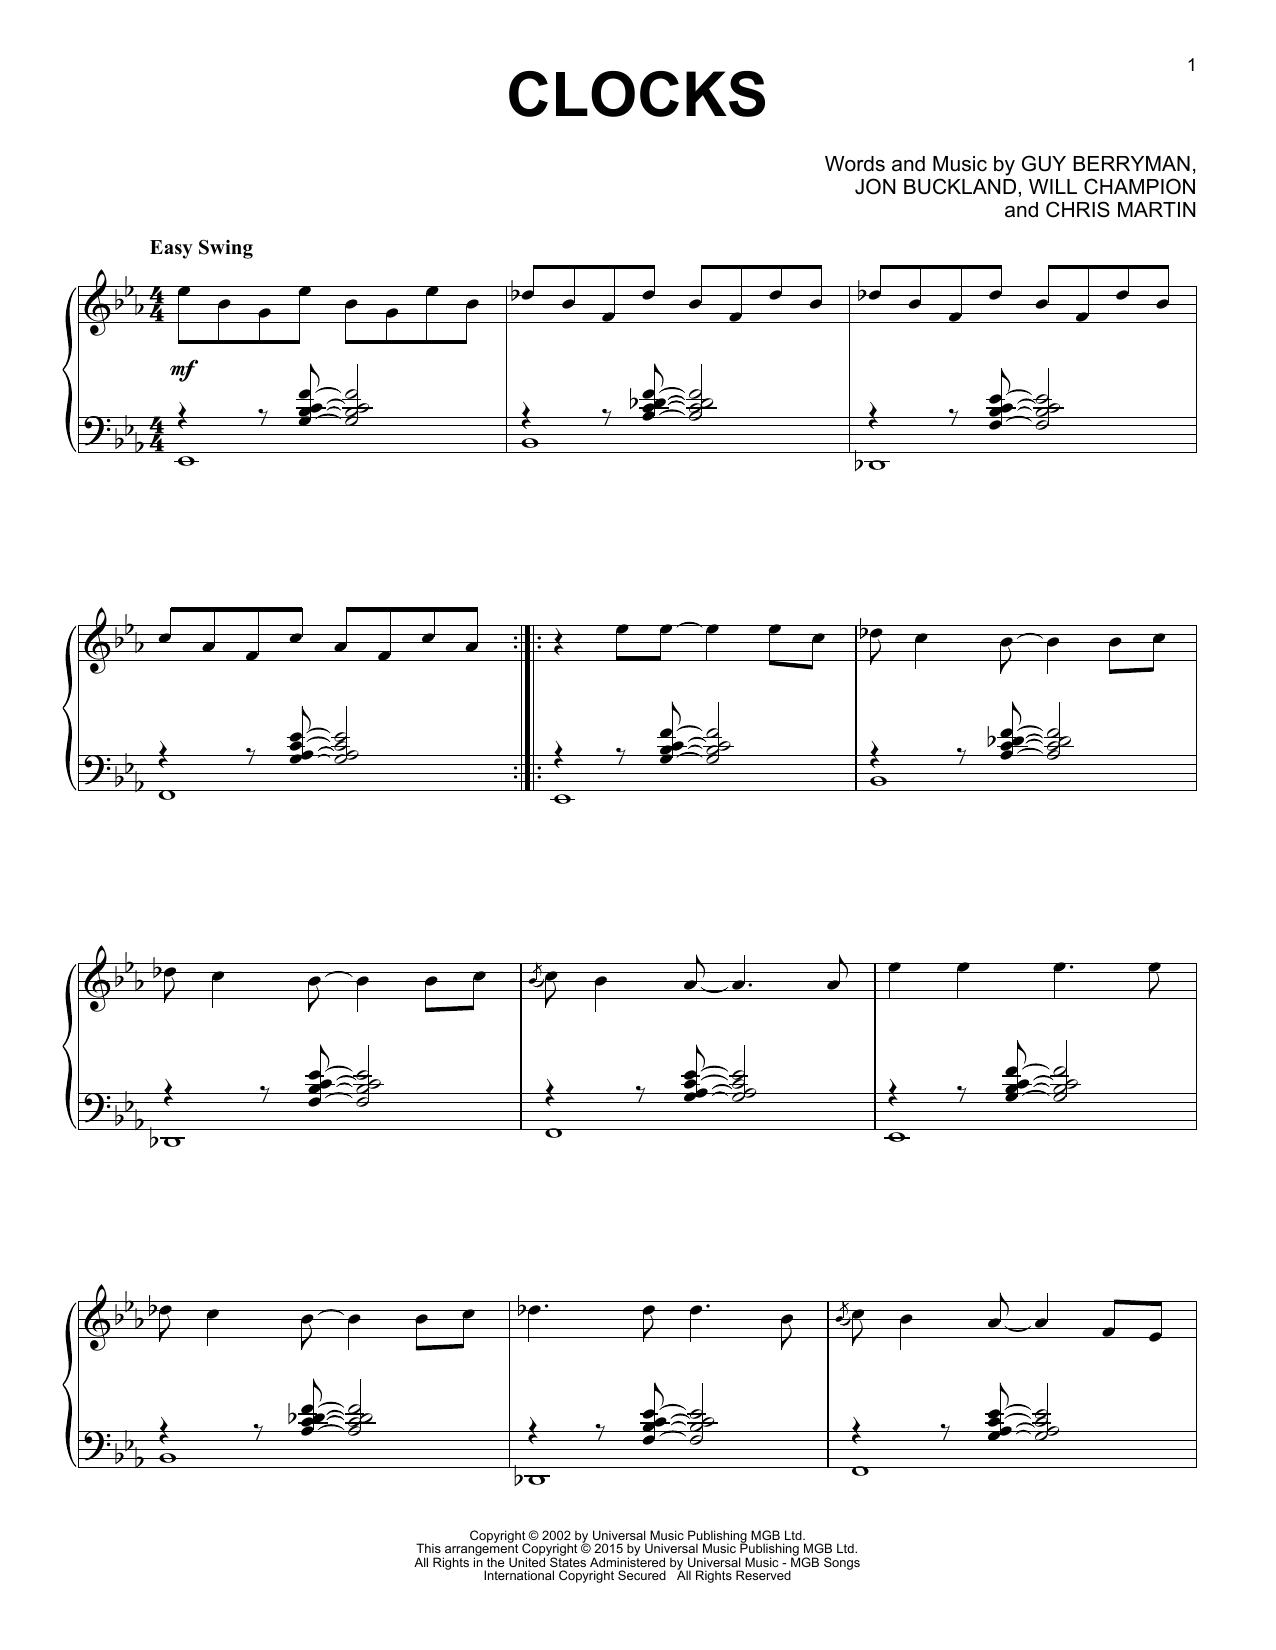 Coldplay Clocks [Jazz version] sheet music notes and chords